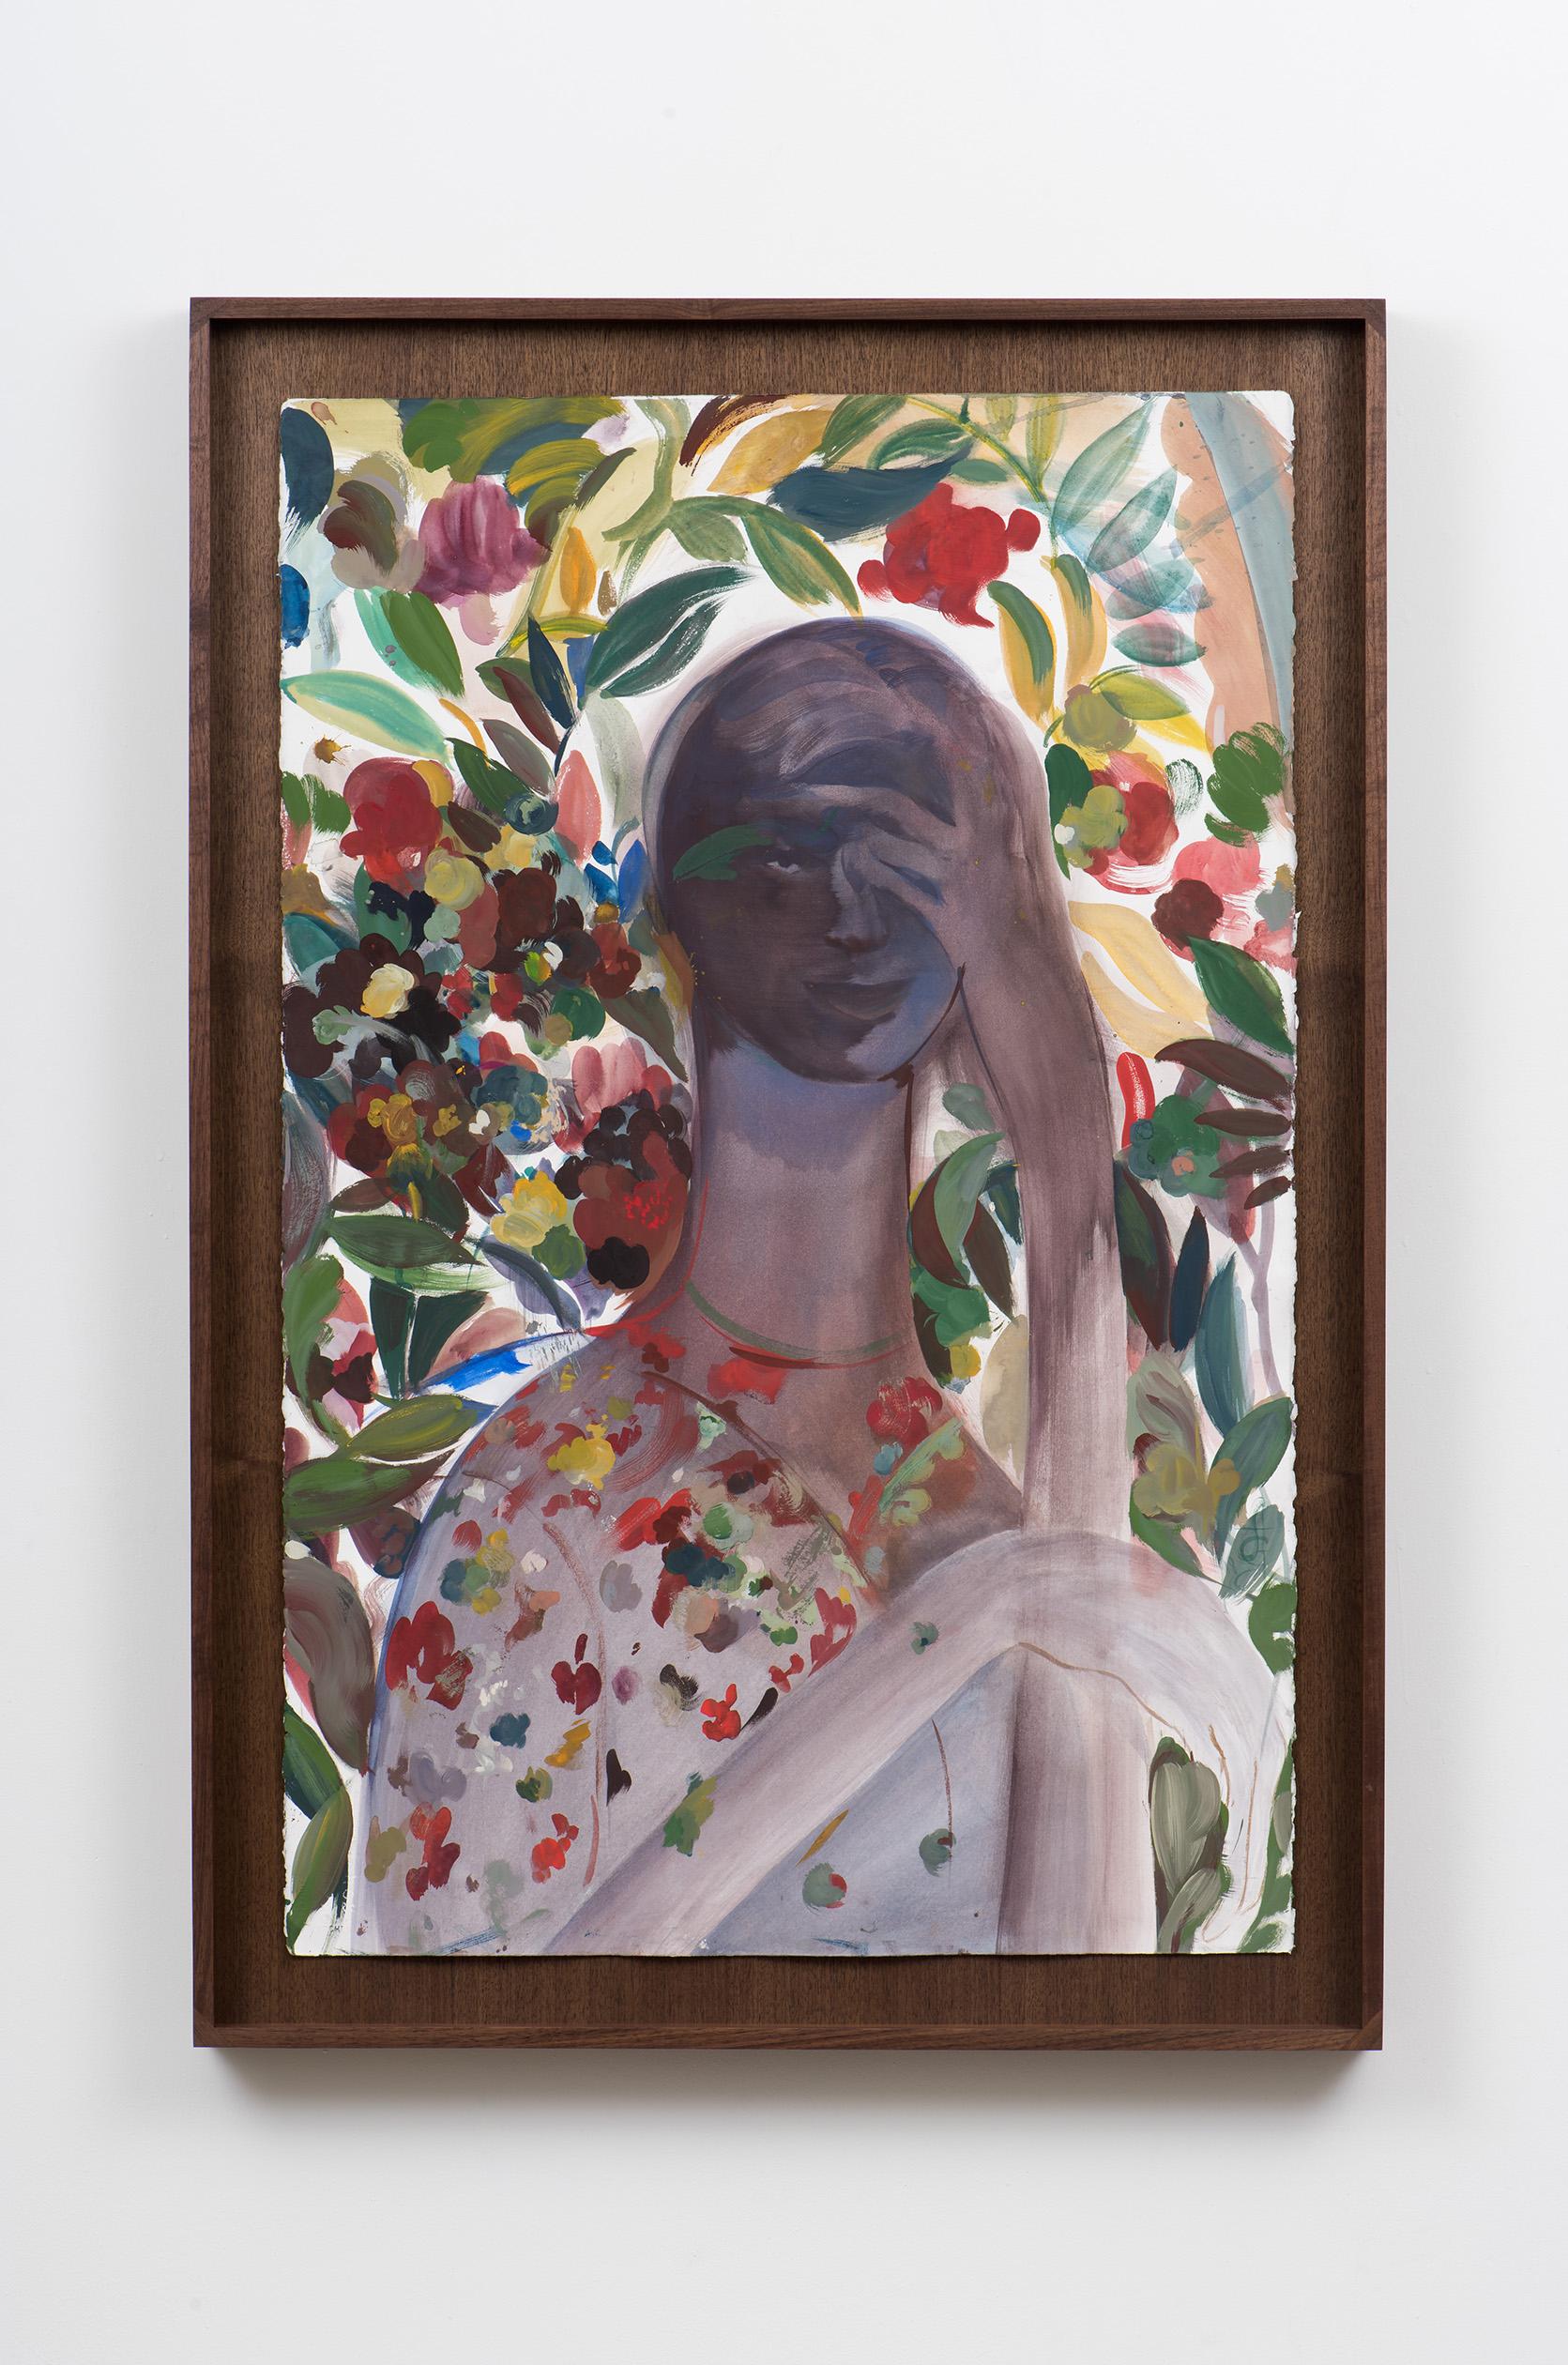 Alexa Guariglia  Adonais , 2018 Gouache and watercolor on paper 44 x 30 1/2 x 2 1/2 inches (framed)